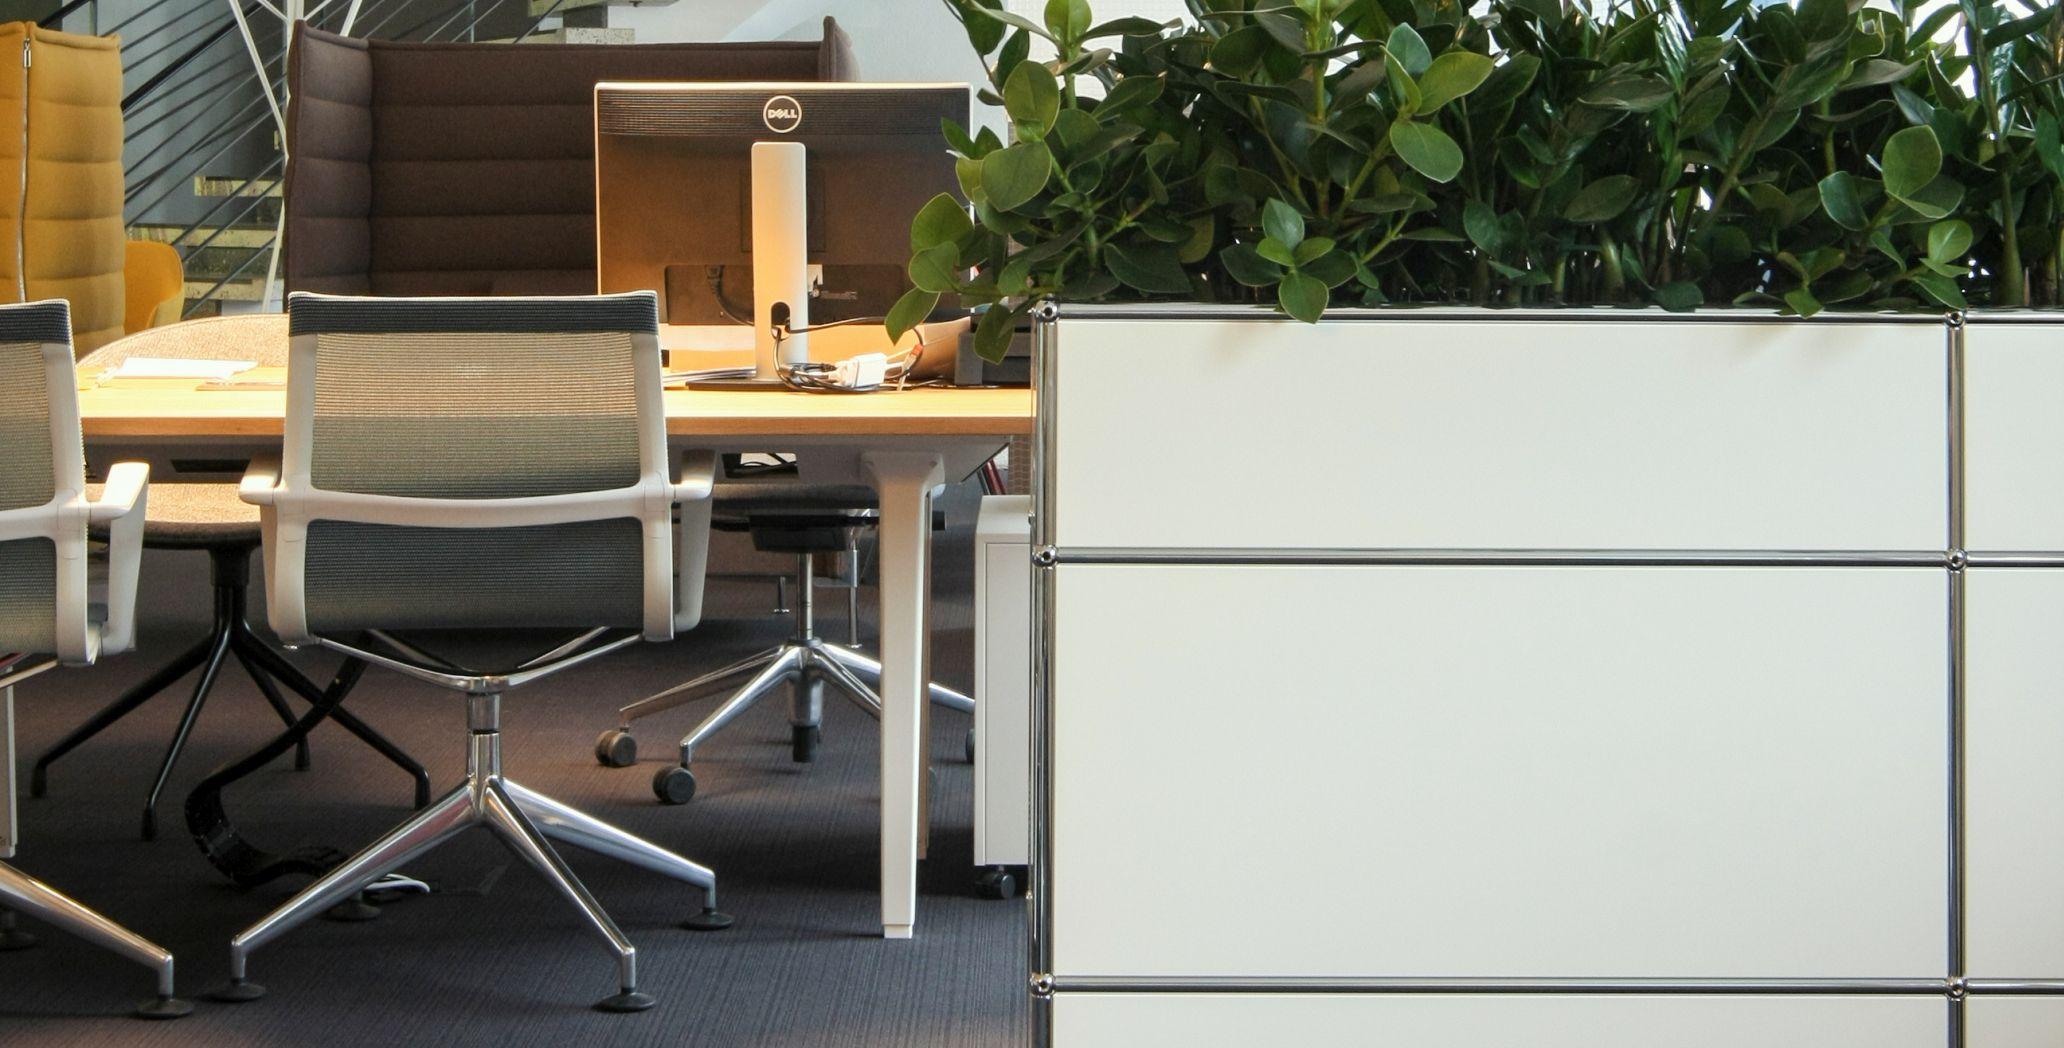 Büromöbel bei smow Stuttgart